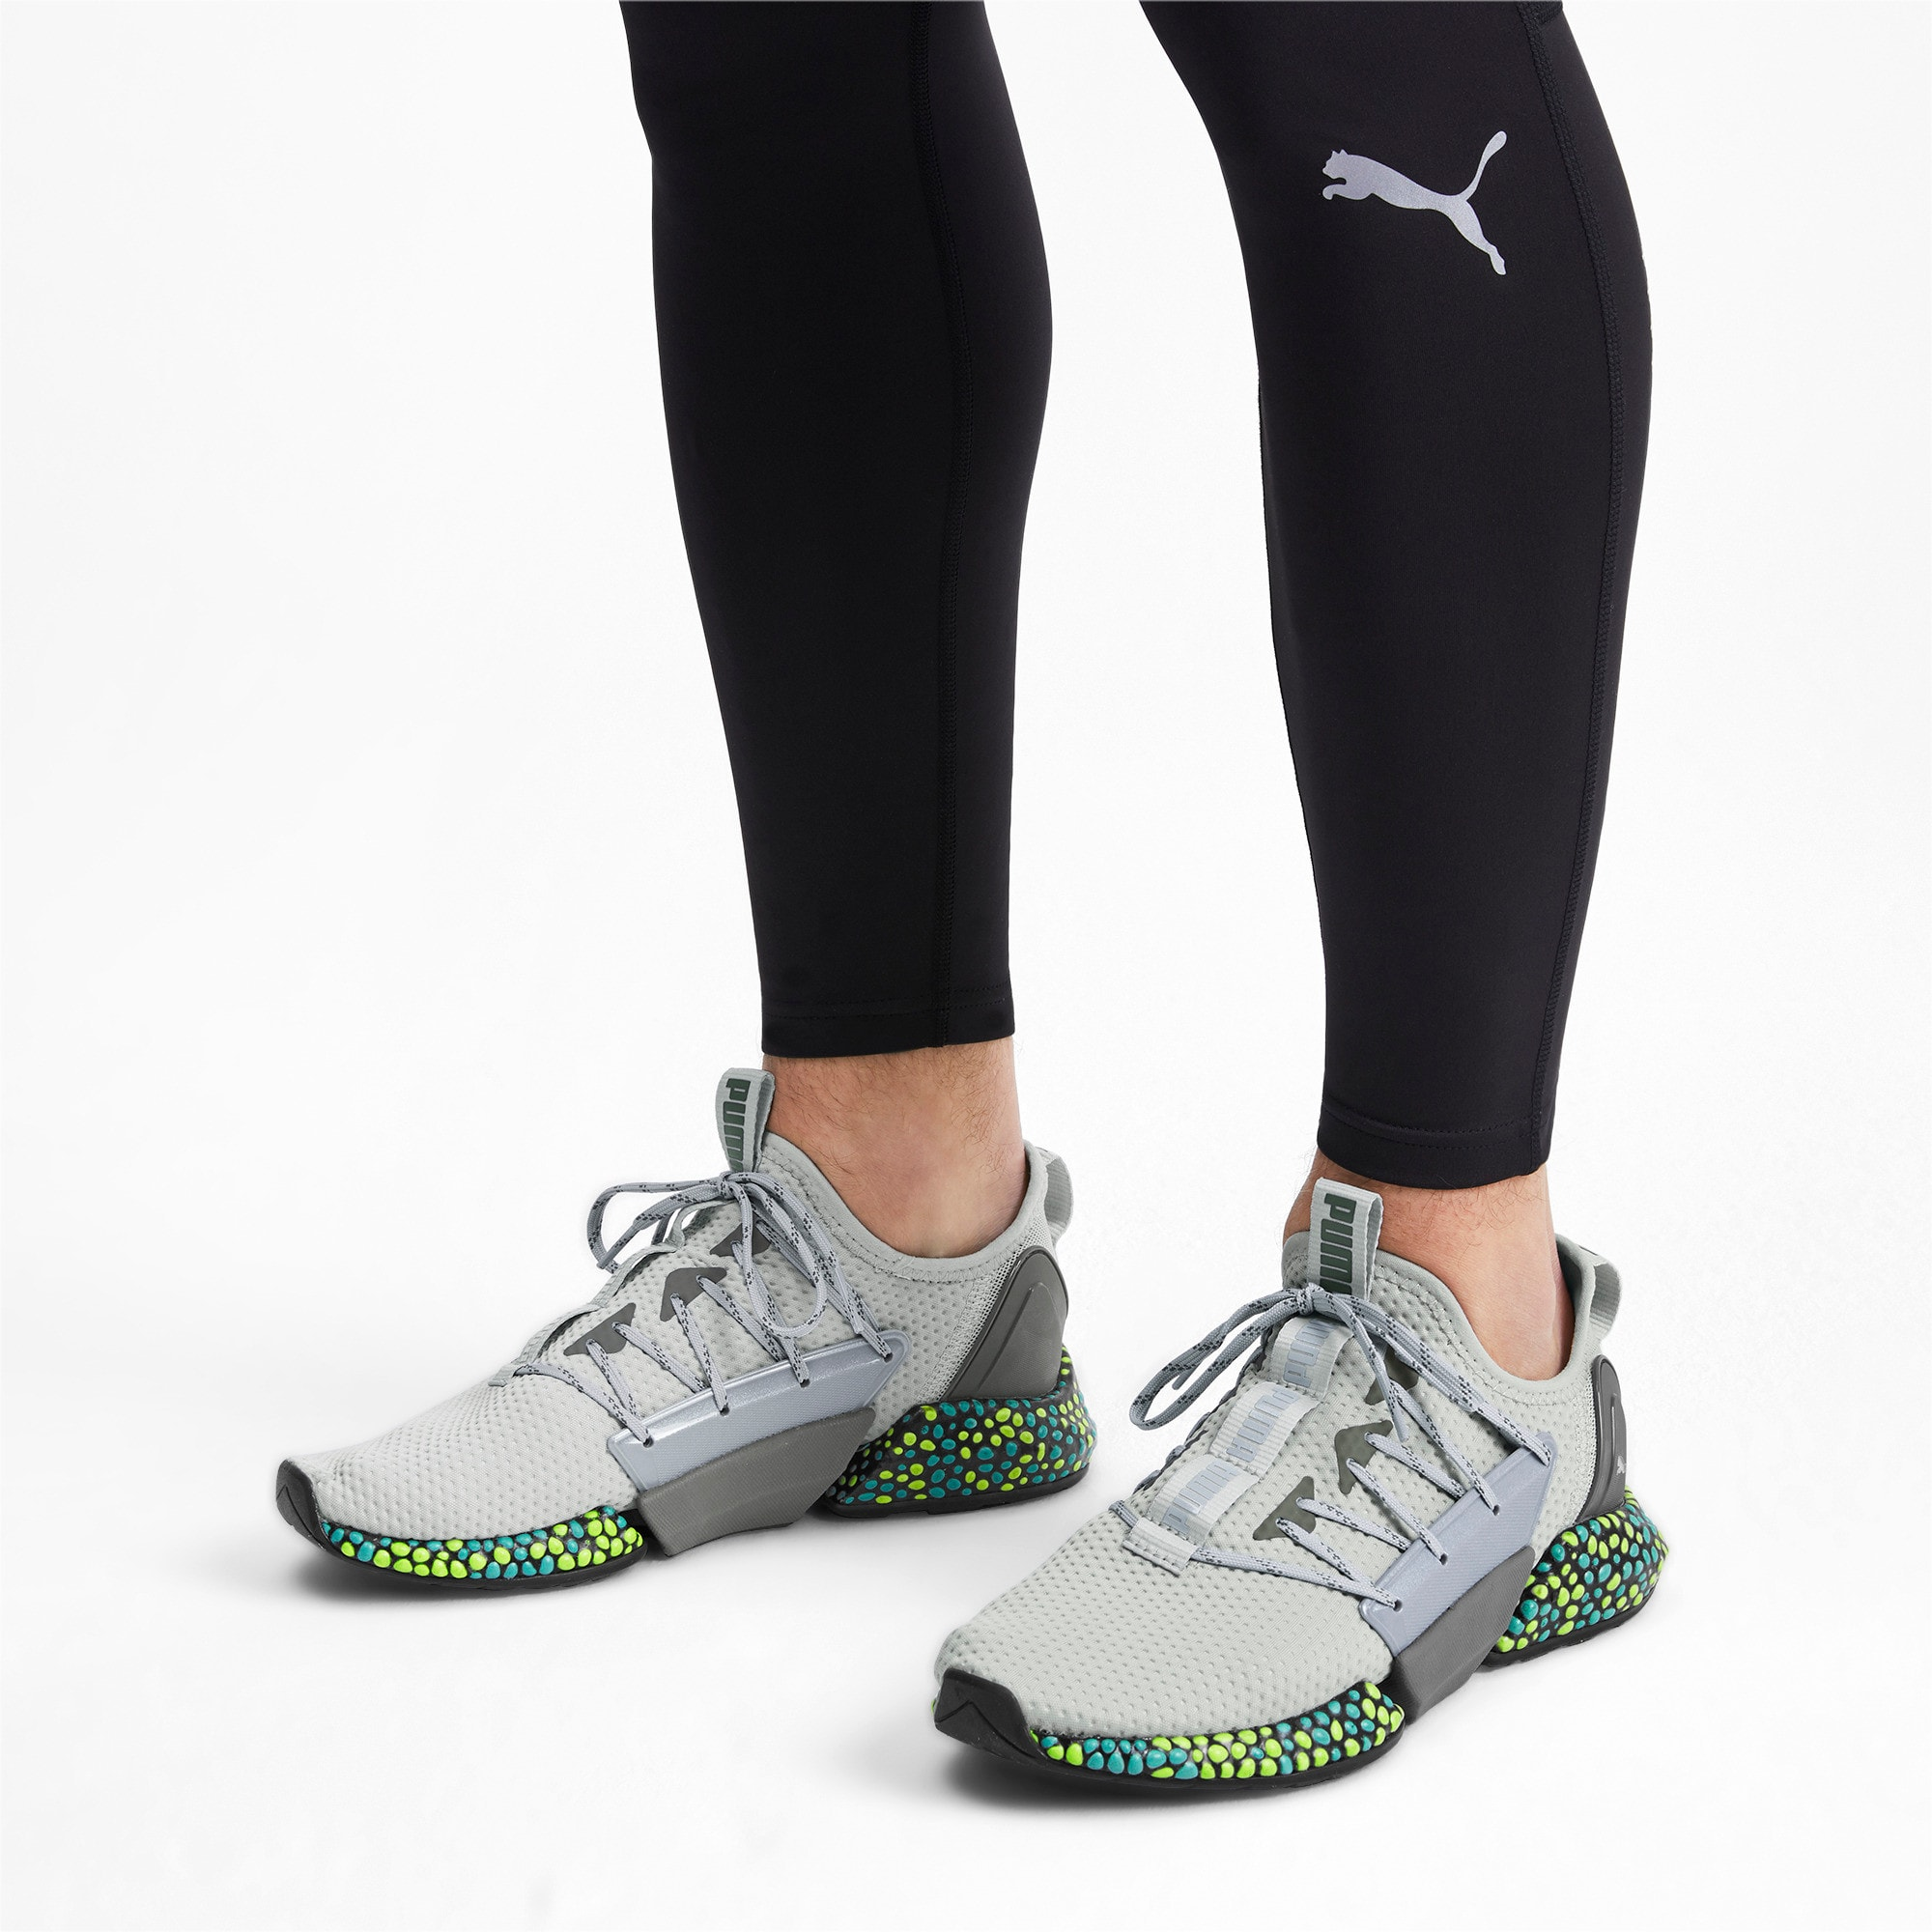 Thumbnail 3 of HYBRID Rocket Aero Men's Running Shoes, High Rise-CASTLEROCK, medium